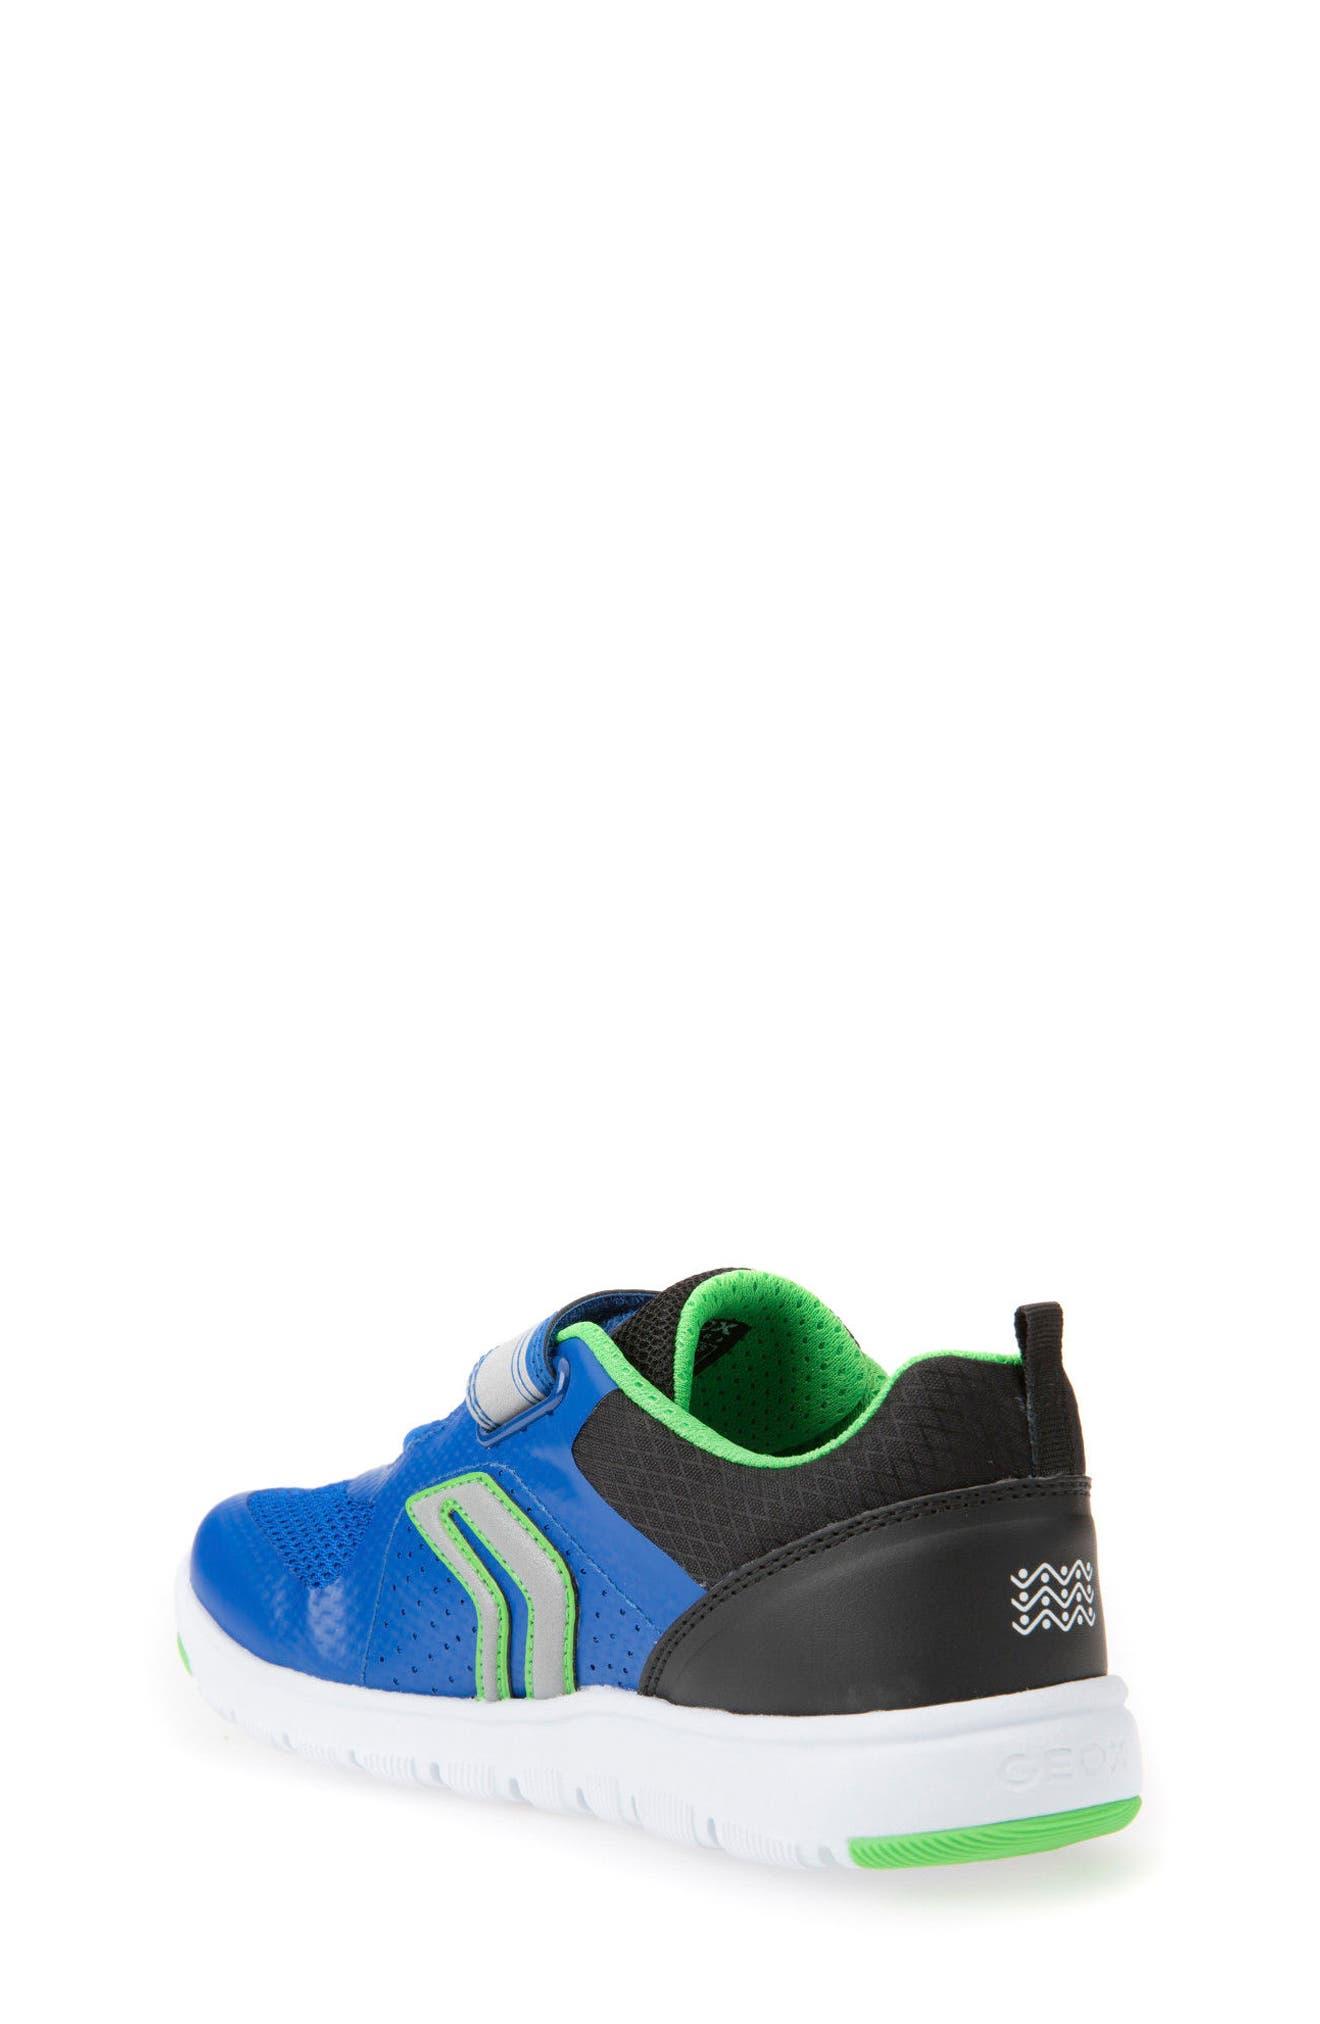 Alternate Image 2  - Geox Xunday Low Top Sneaker (Toddler, Little Kid & Big Kid)